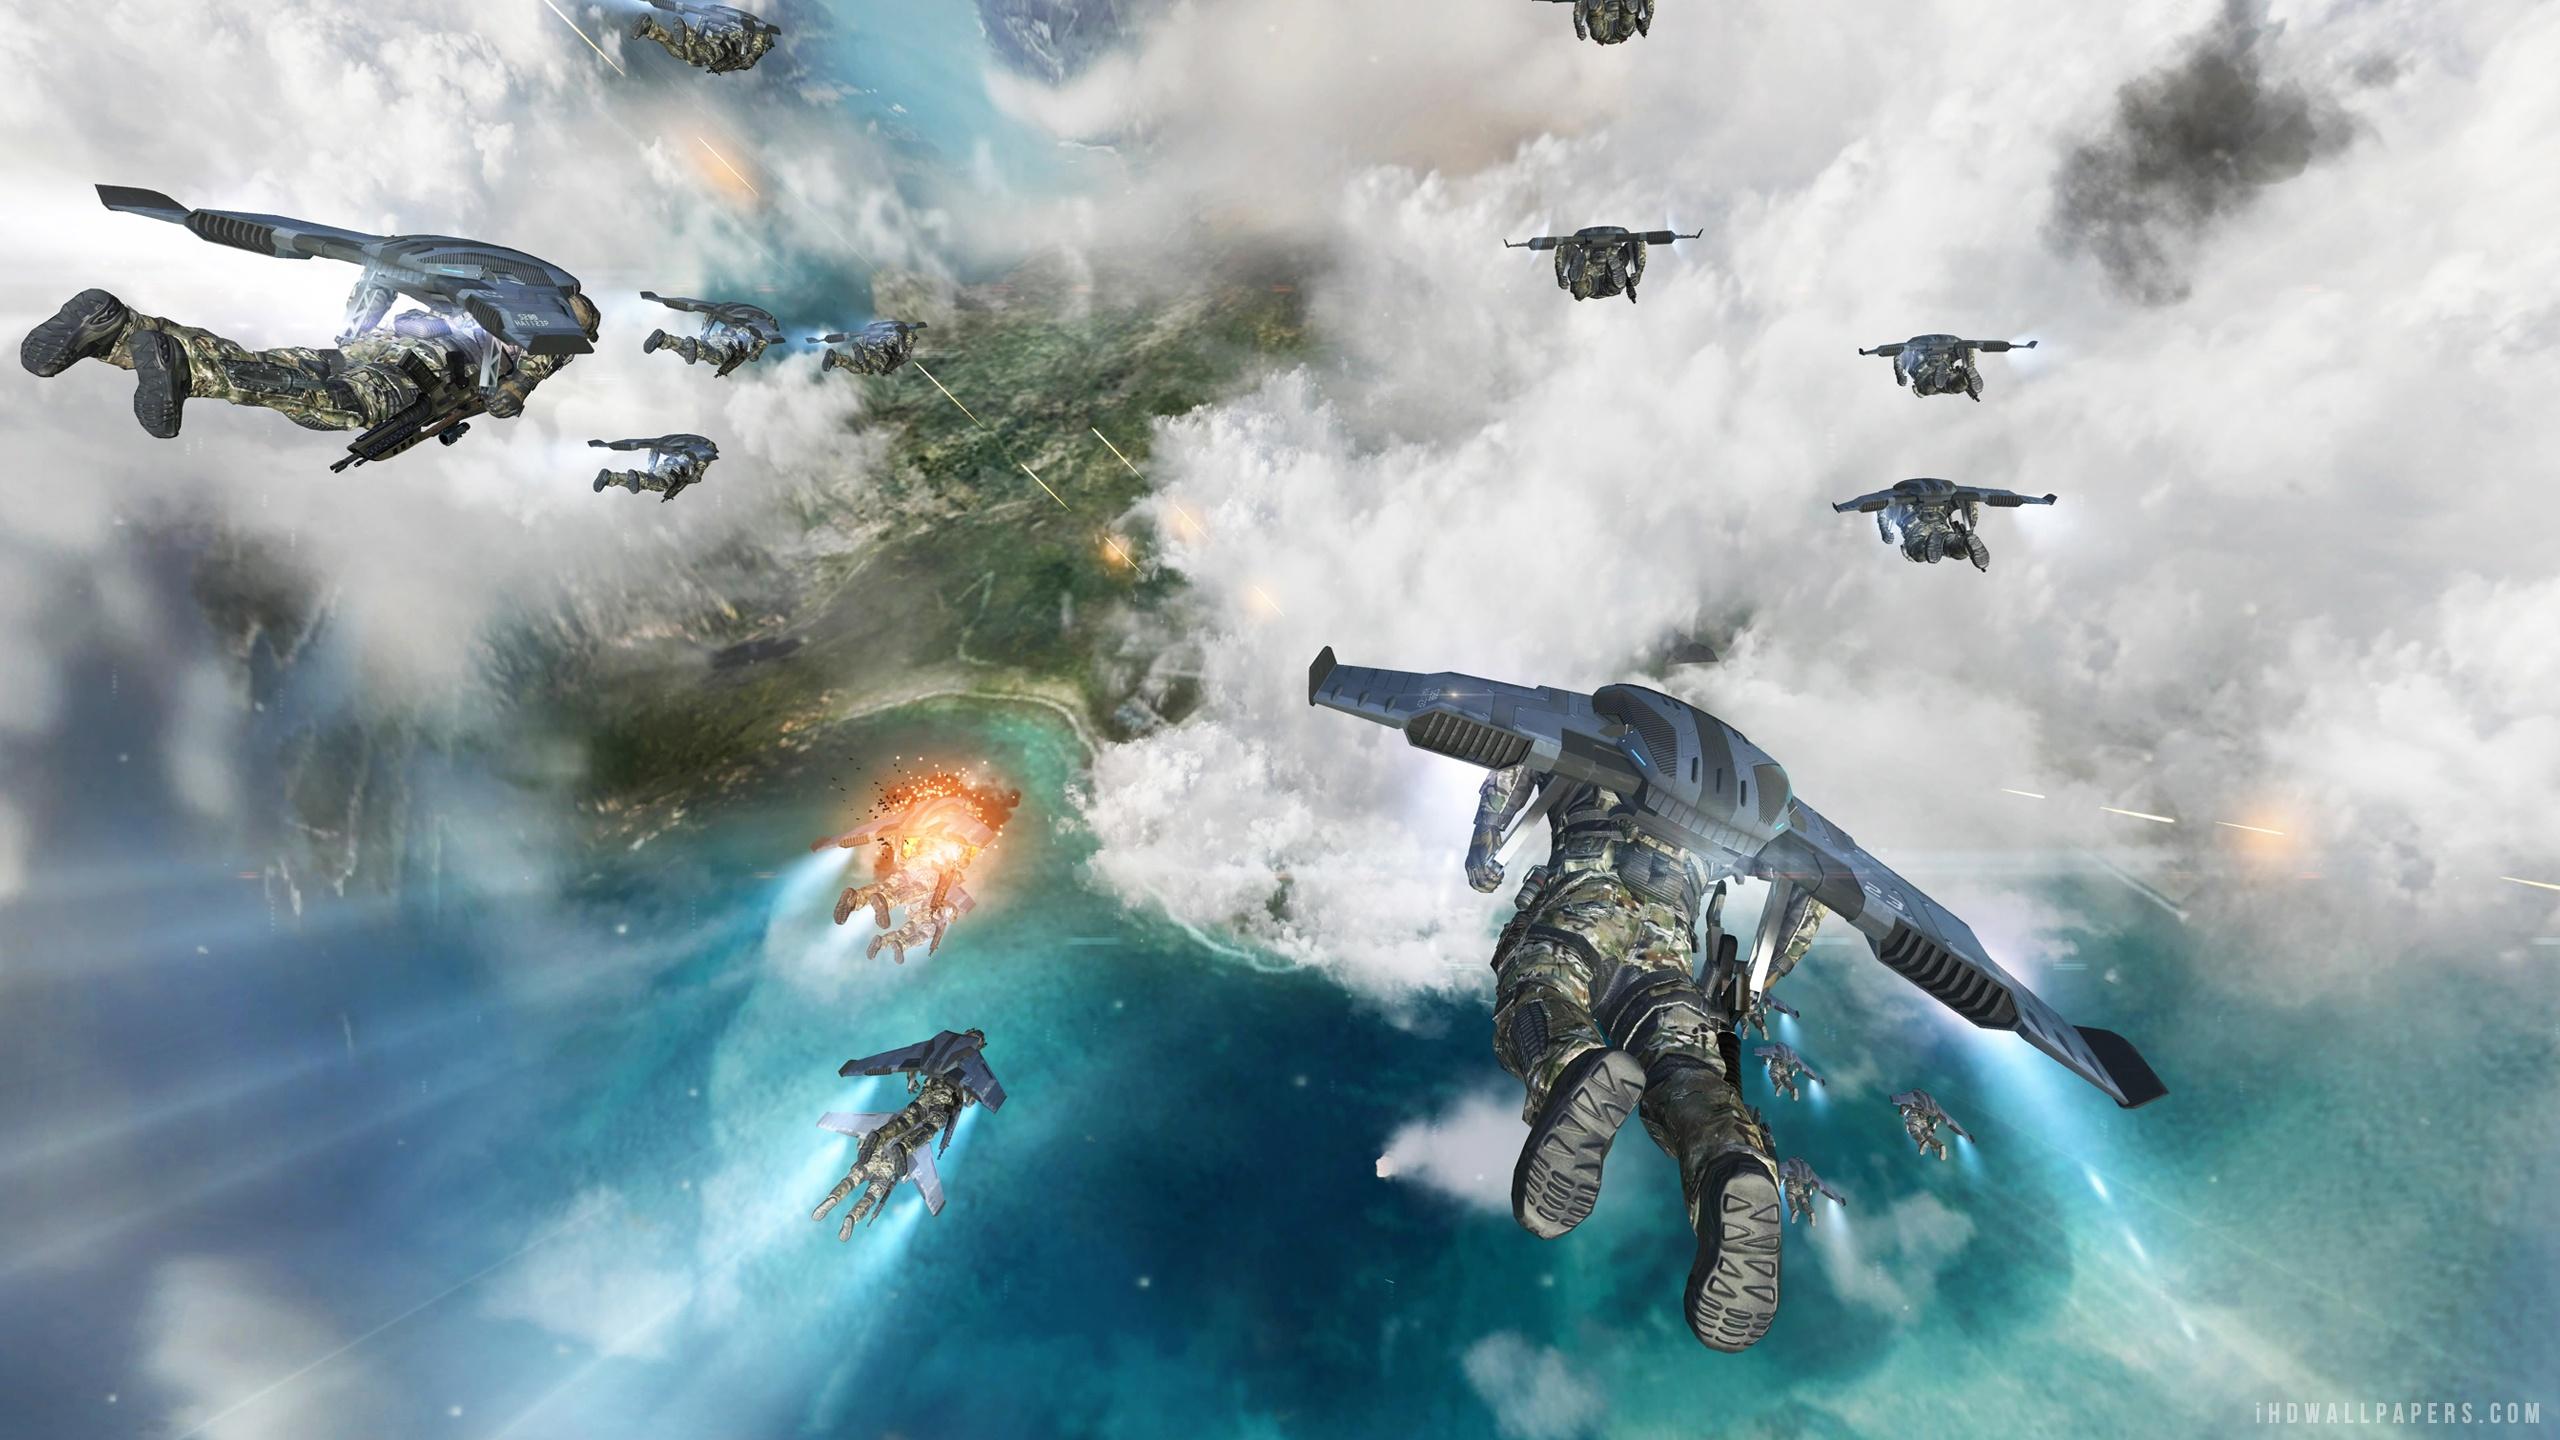 Call Of Duty Black Ops 2 Wallpaper 1920 X 1080: 2560 X 1440 Wallpaper Black